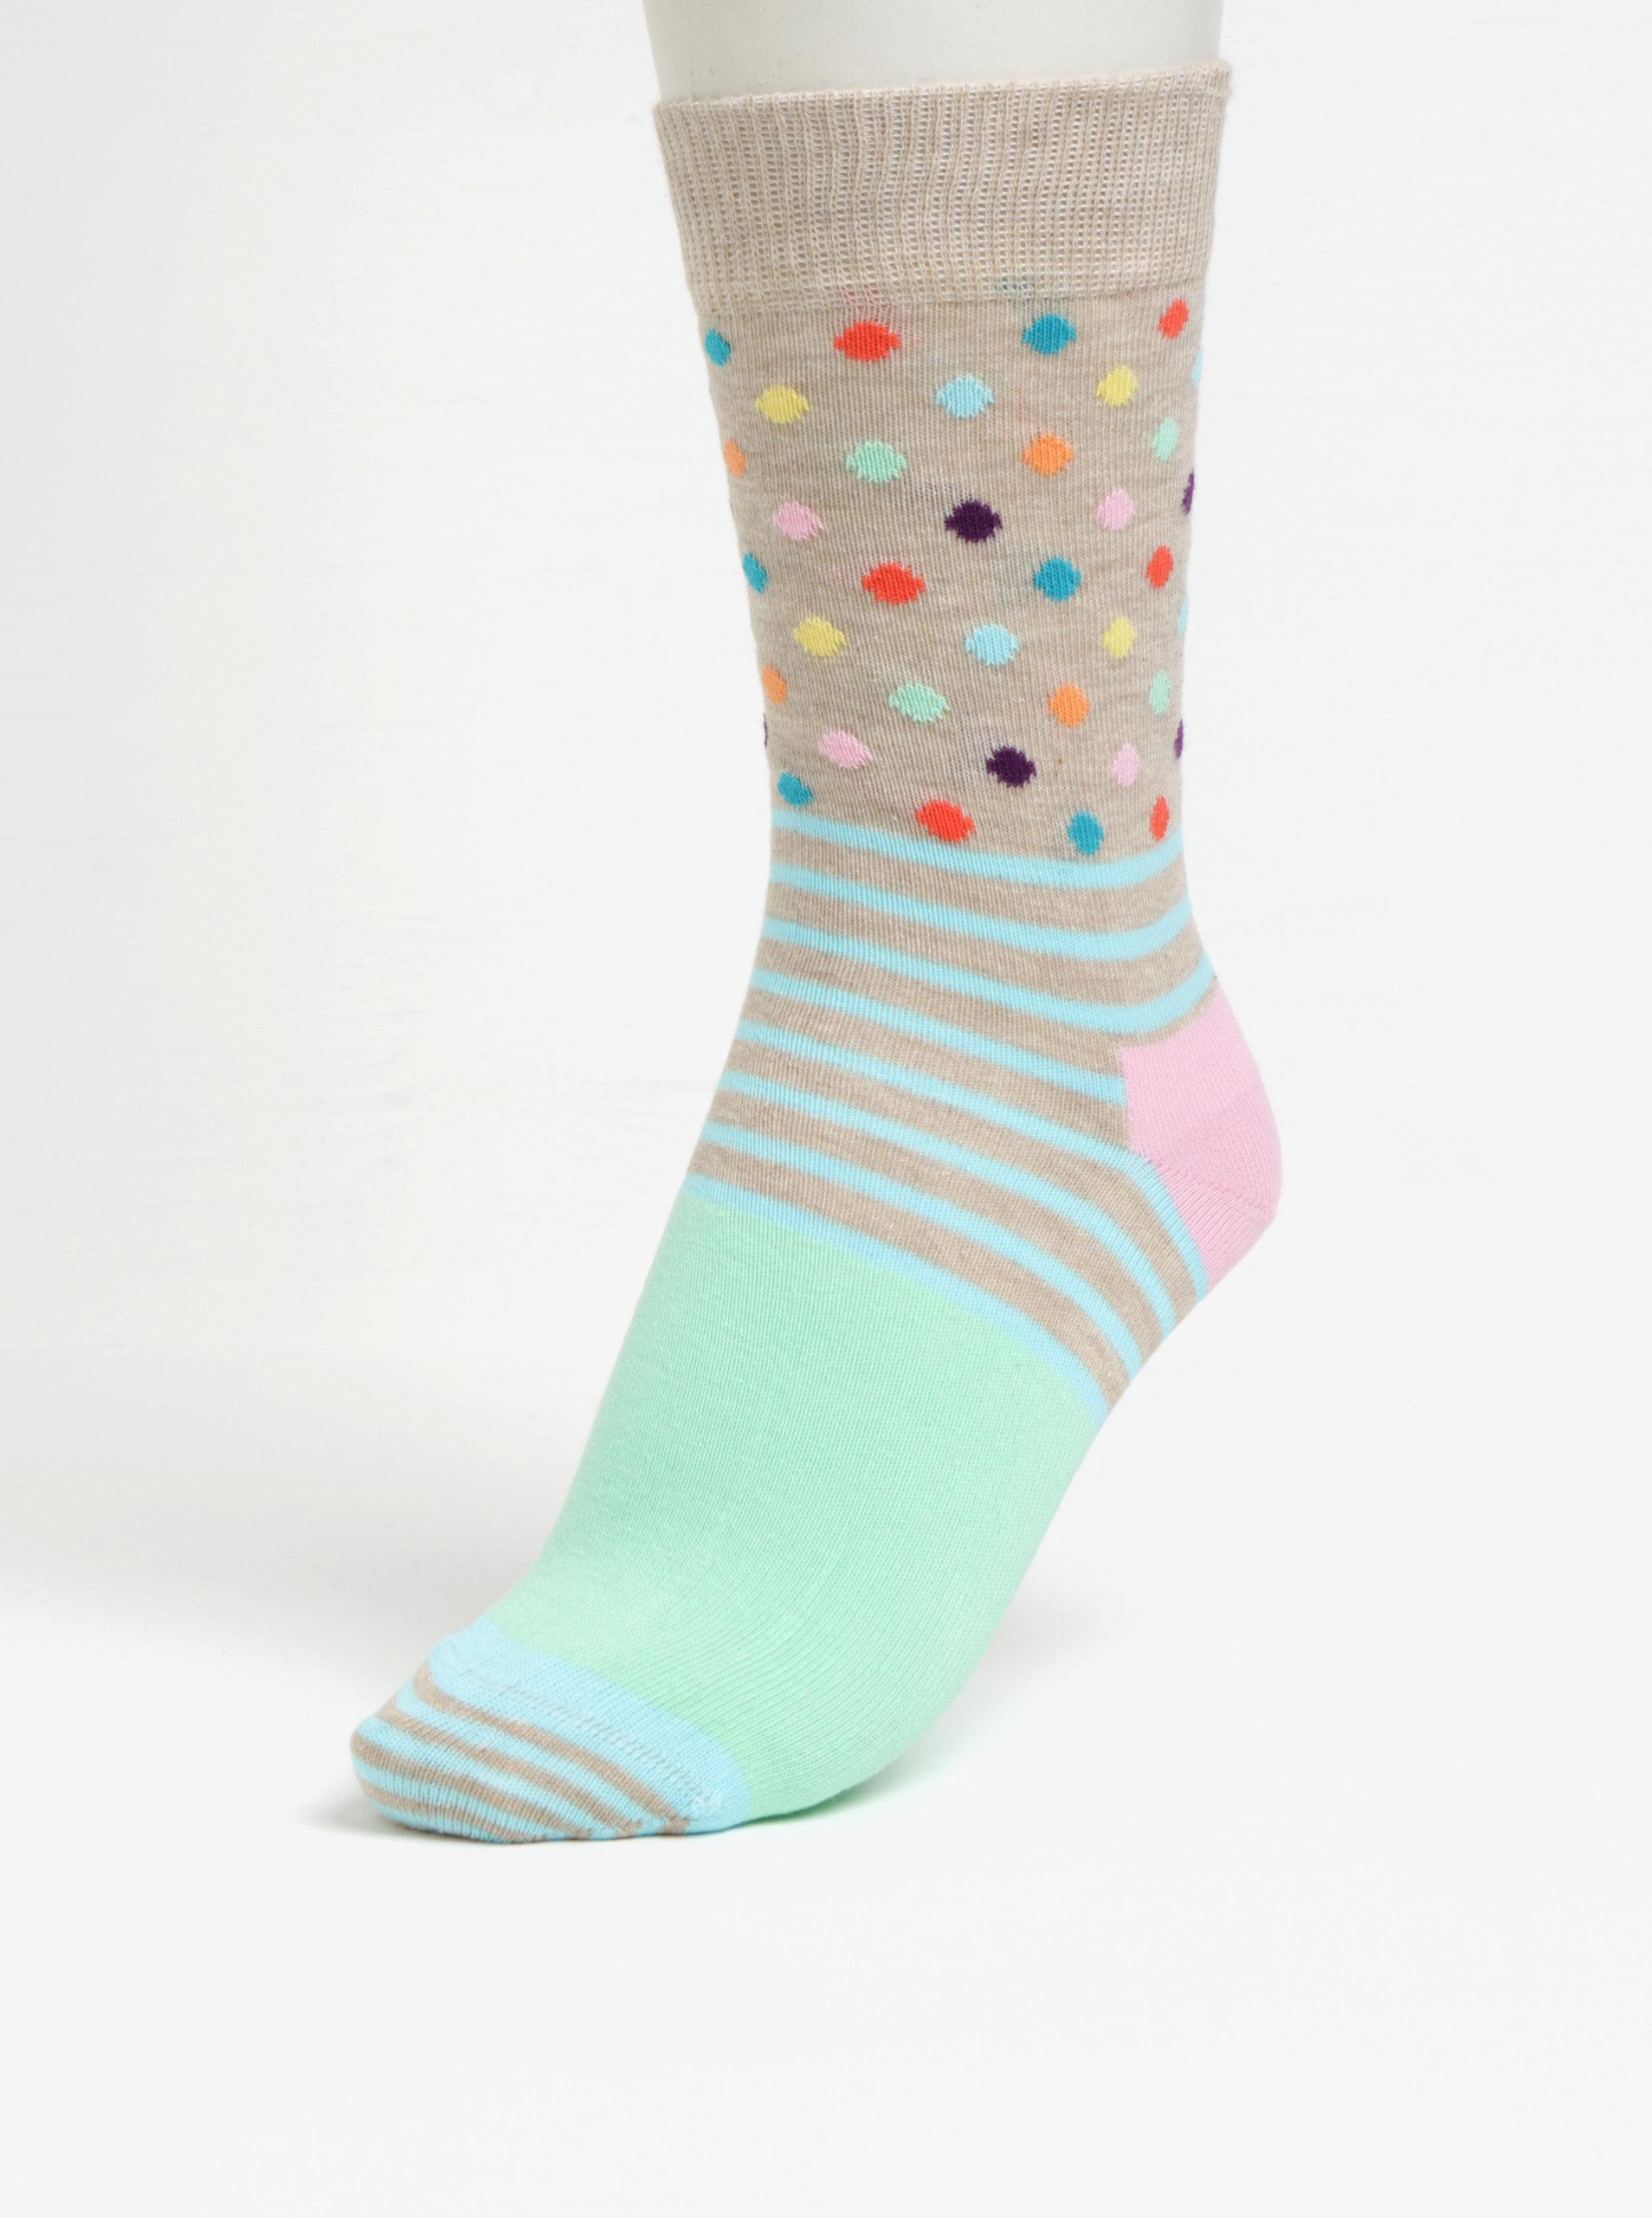 Zeleno-béžové dámské vzorované ponožky Happy Socks Stripes Dots ... 9f63299995